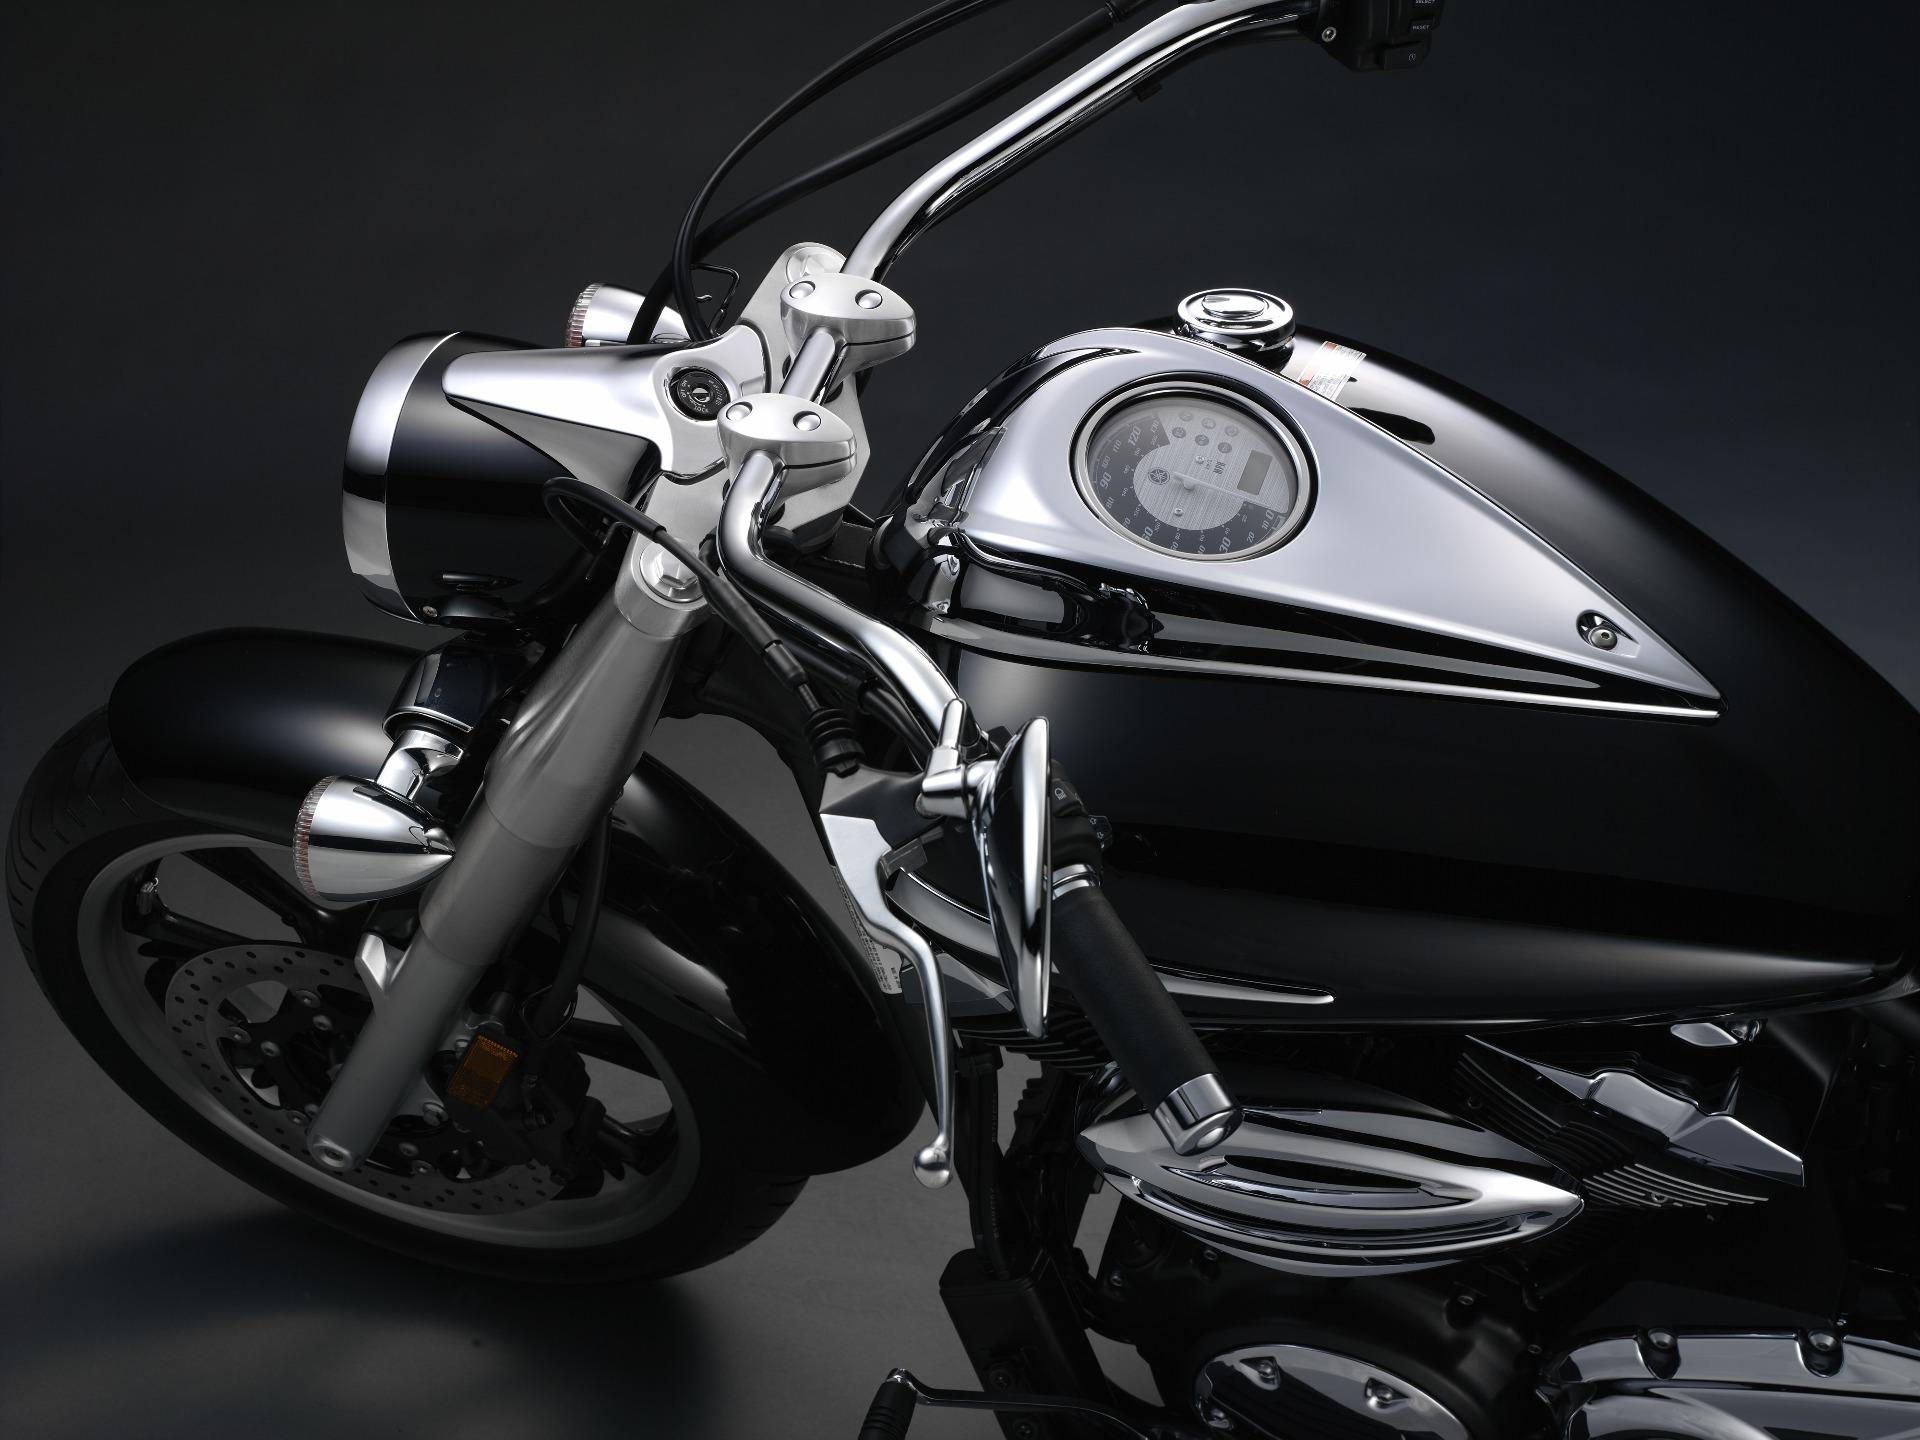 Yamaha XVS 950 Drag Star